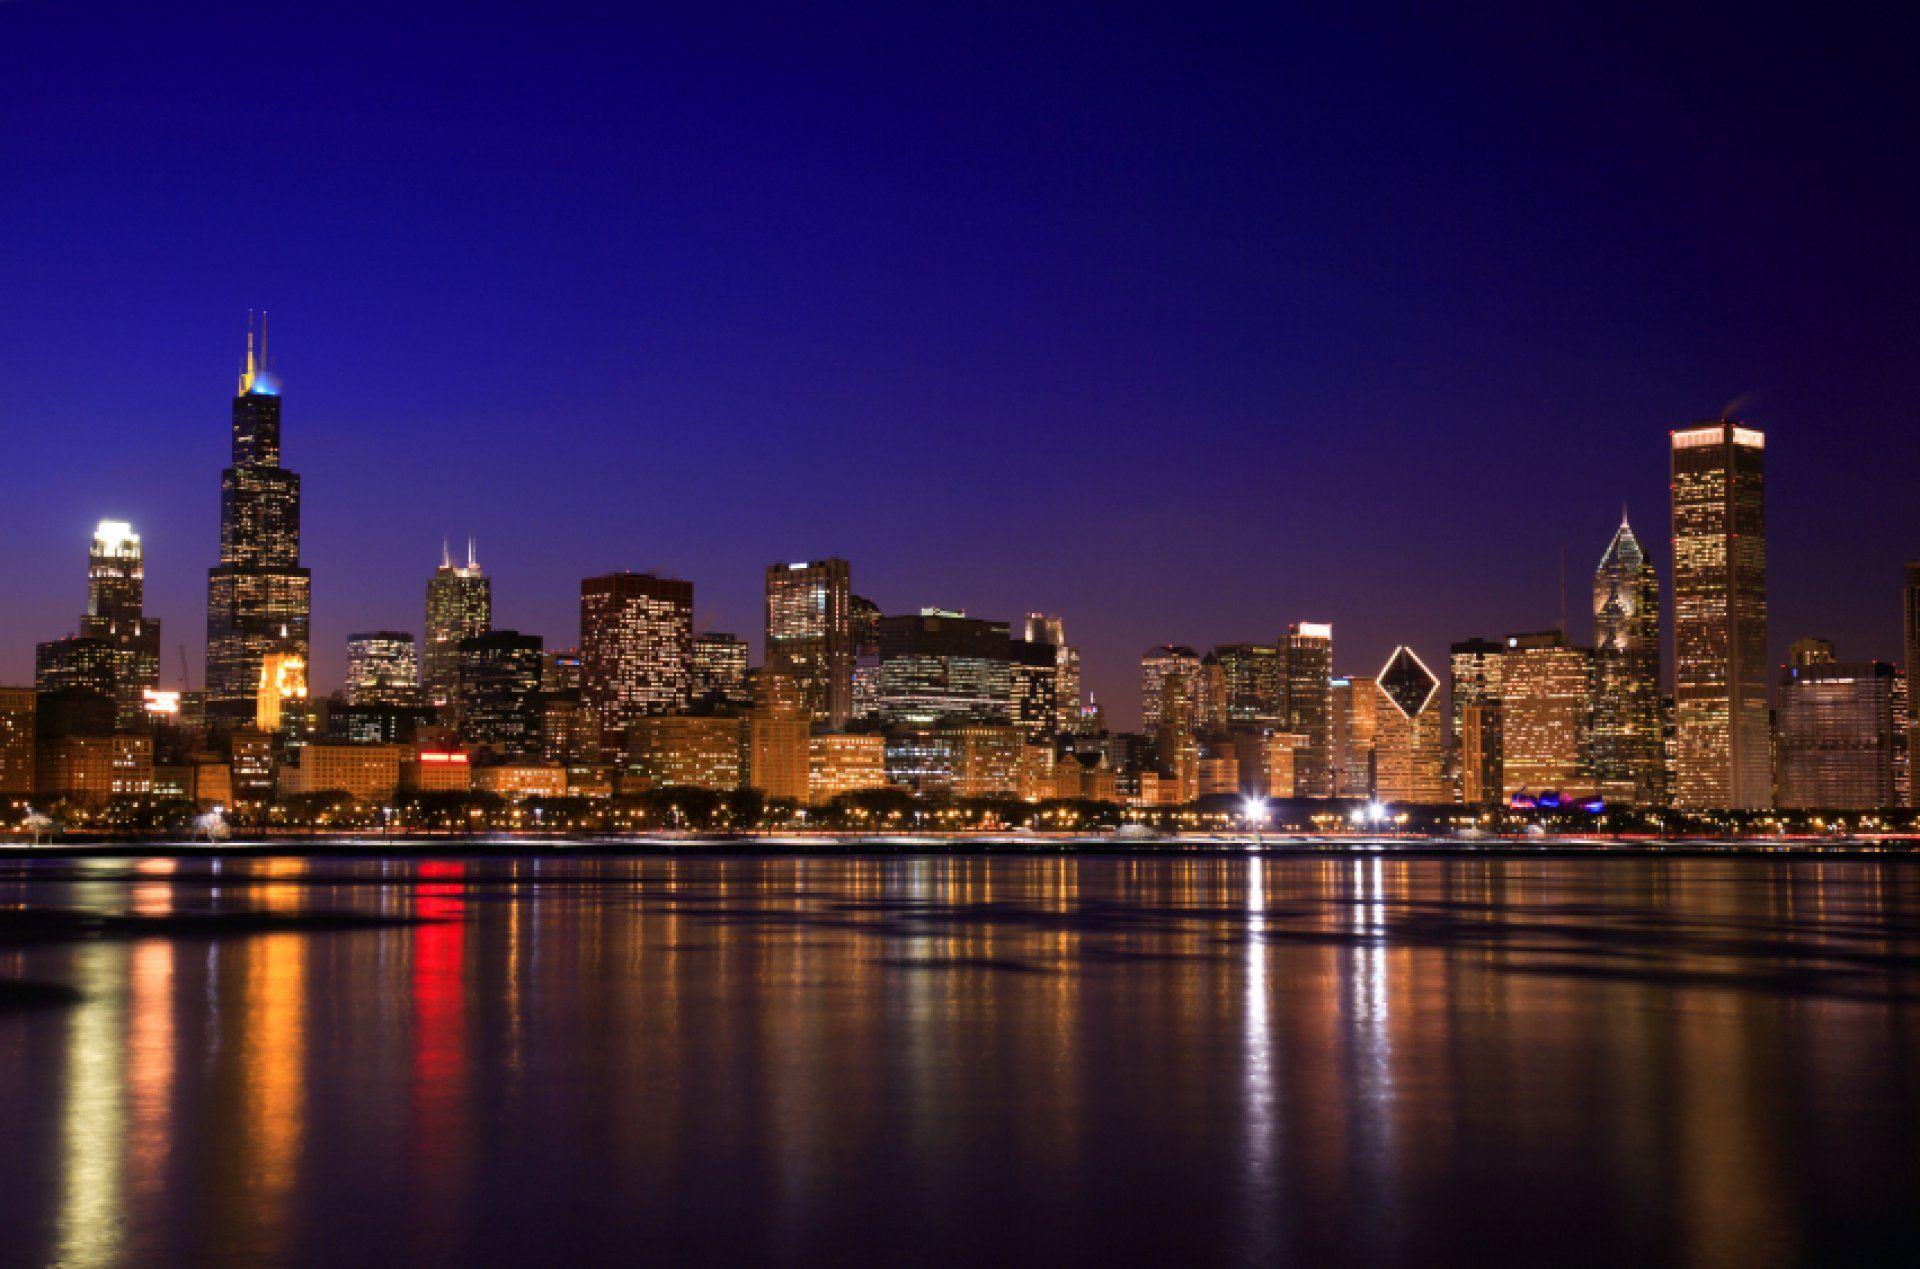 Must see Wallpaper Night Chicago - chicago-skyline-desktop-wallpaper-1  Image.jpg